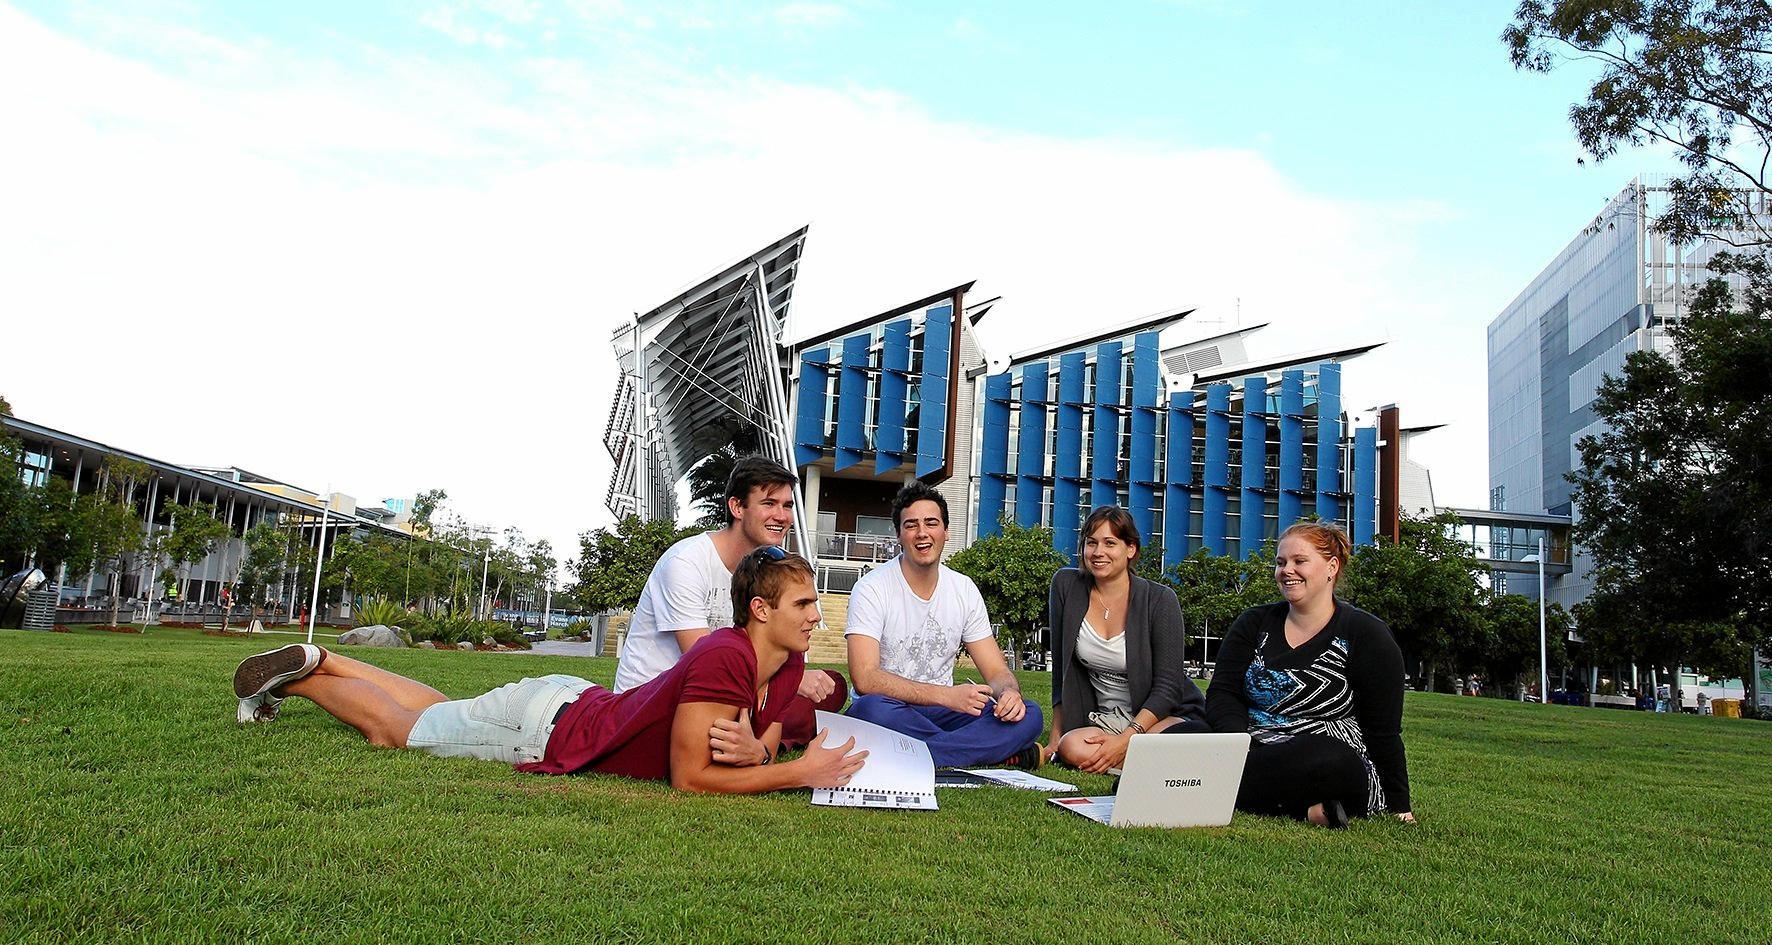 University of the Sunshine Coast students Linnea Persson, Rory Sanders, Jackson Kellaway, Mark Turner and Sharni Wilson.